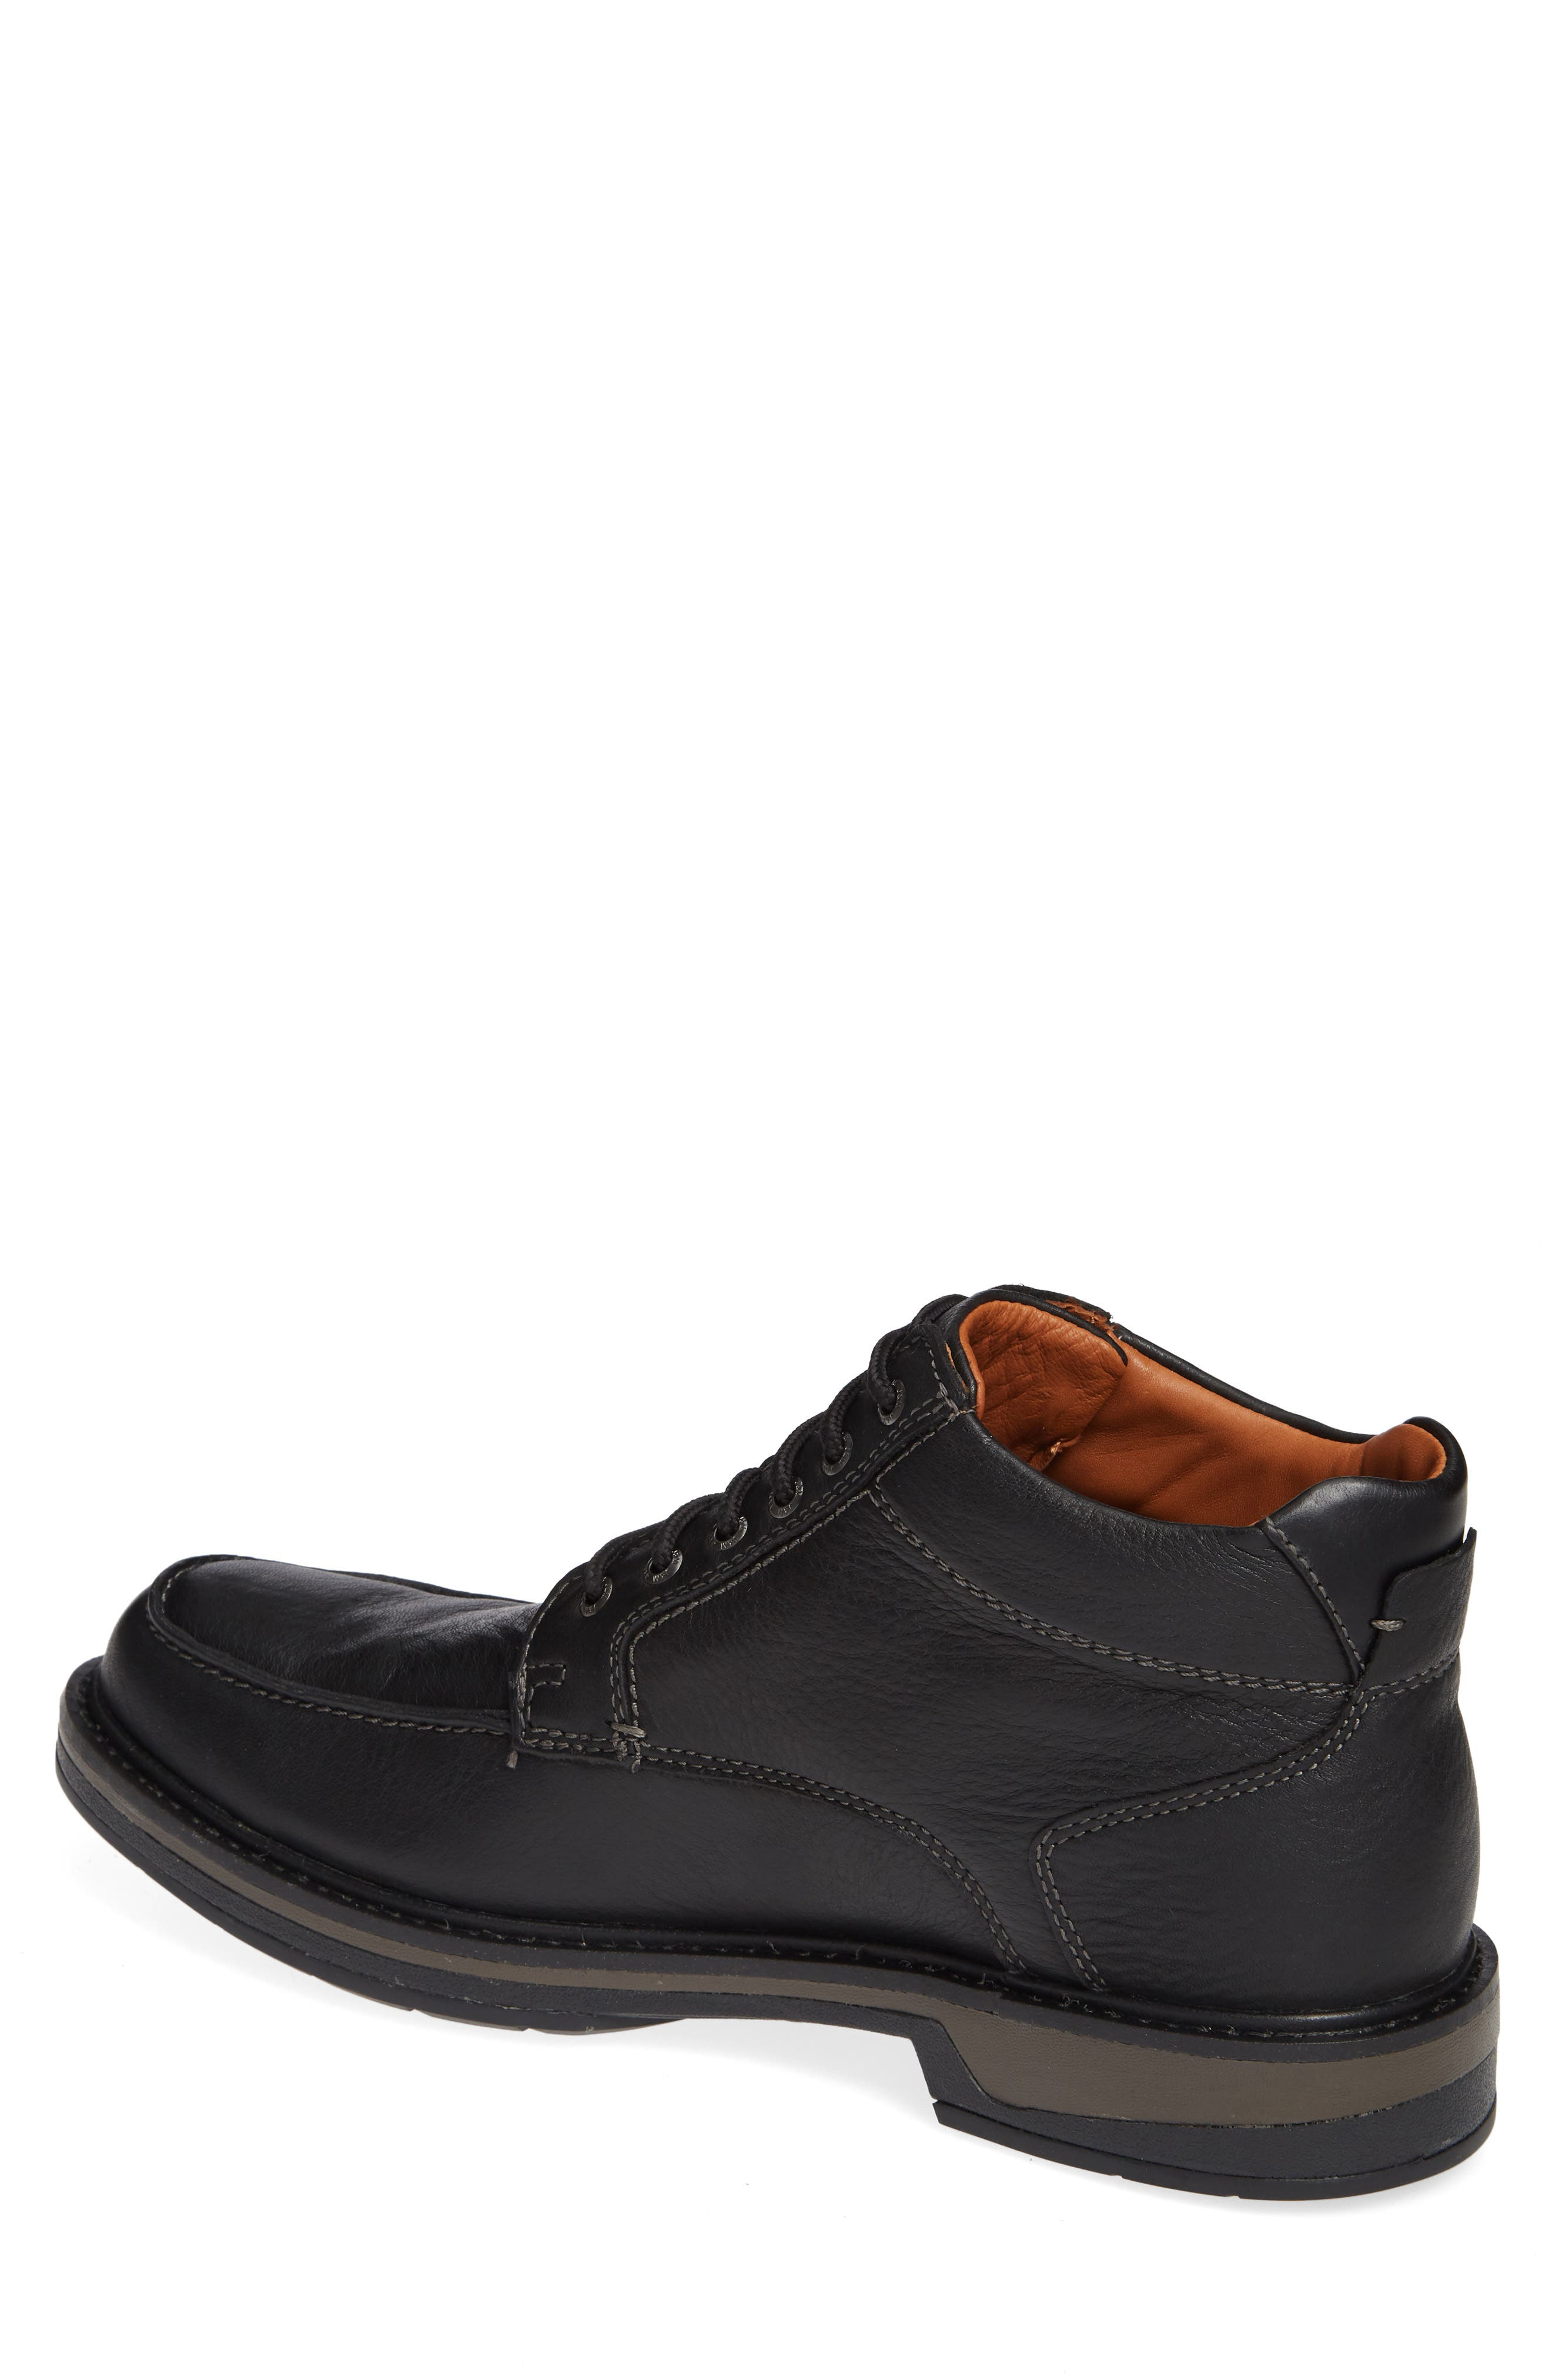 Rutledge Waterproof Moc Toe Boot,                             Alternate thumbnail 2, color,                             BLACK LEATHER